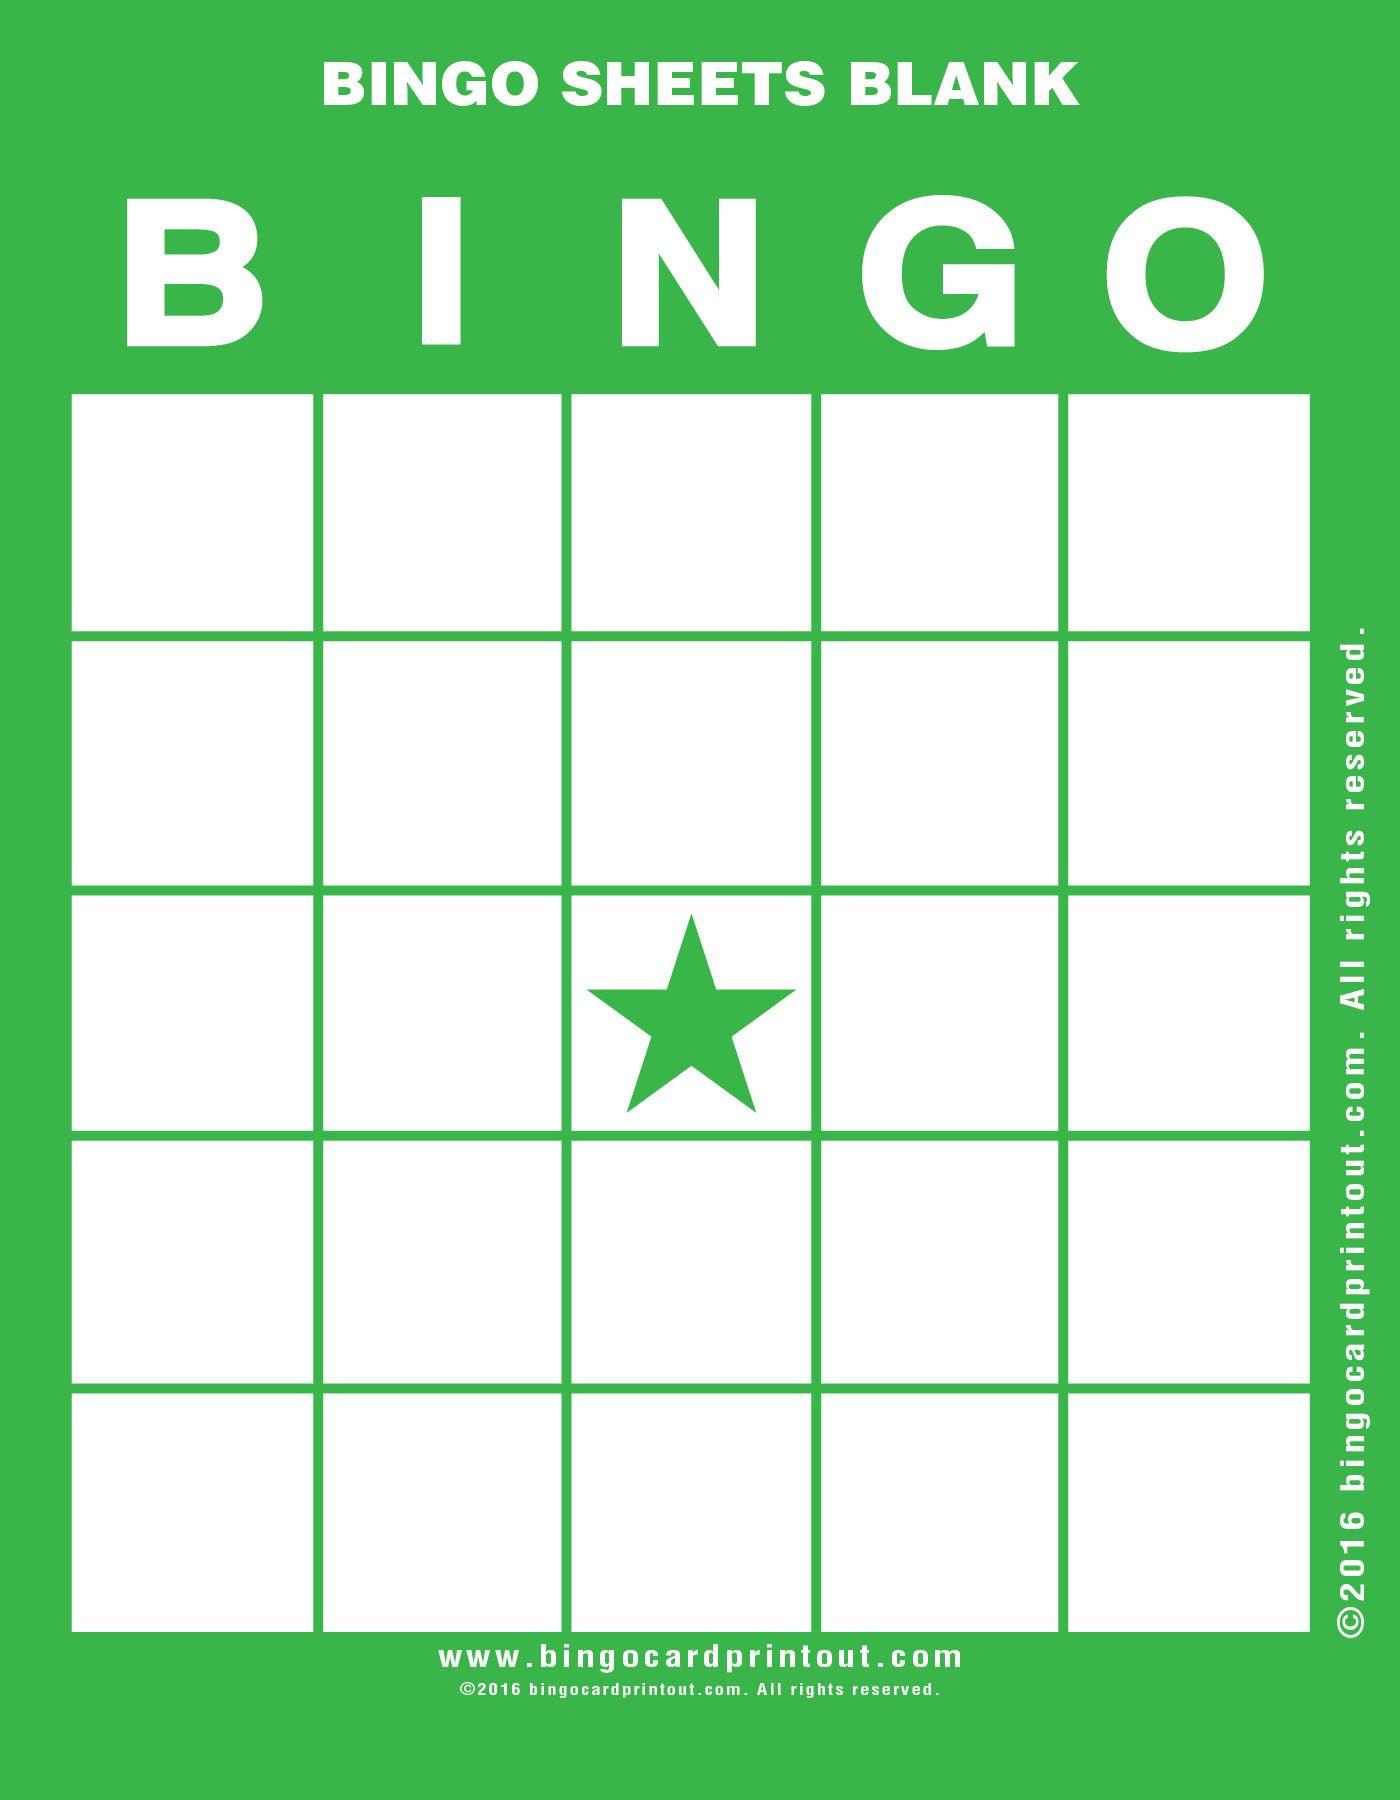 Bingo Sheets Blank 4 | Bingo Cards Printable, Bingo Card